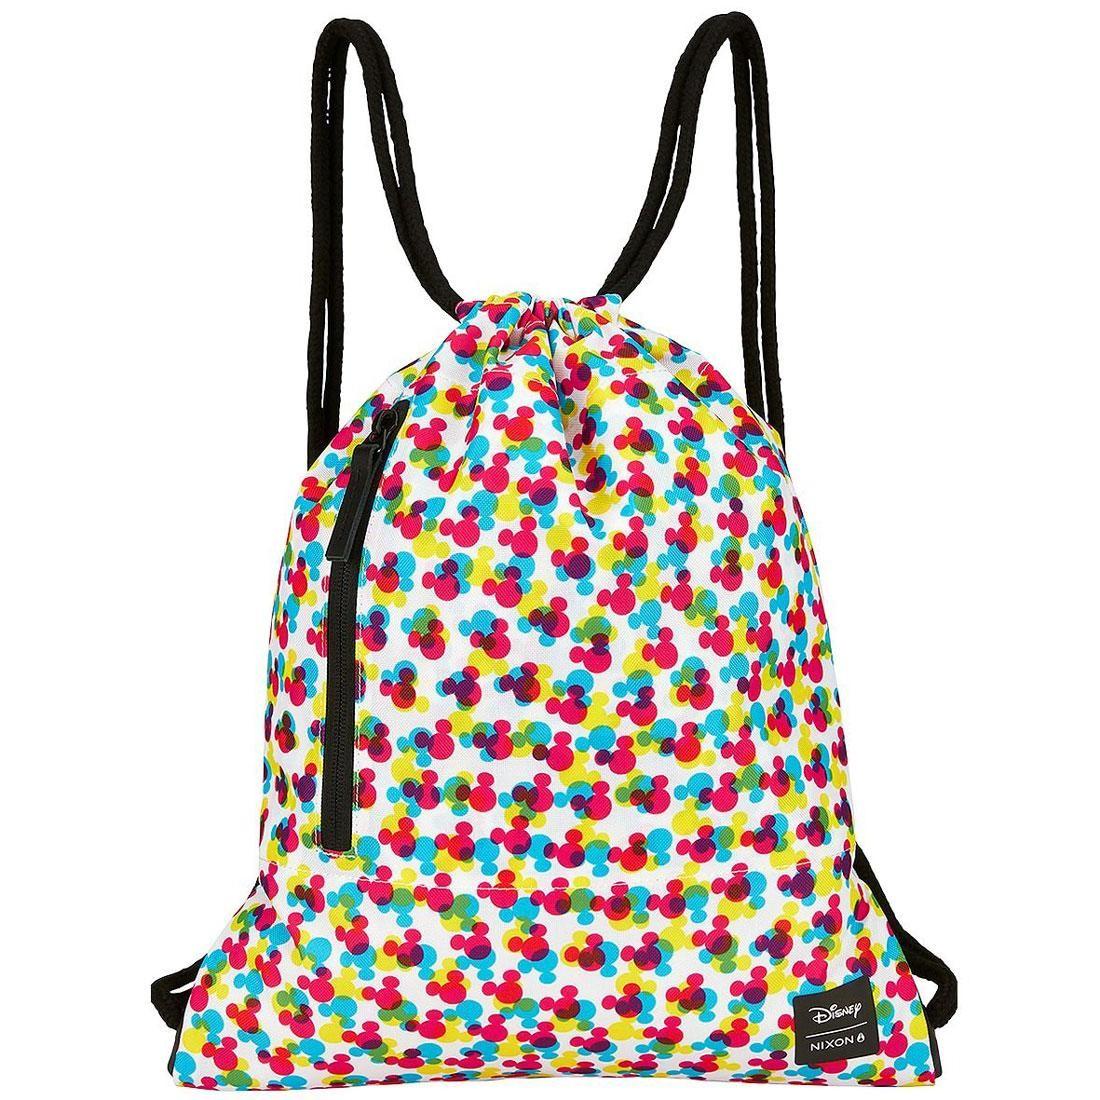 Nixon x Disney Everyday Cinch Bag - Mickey (multi)